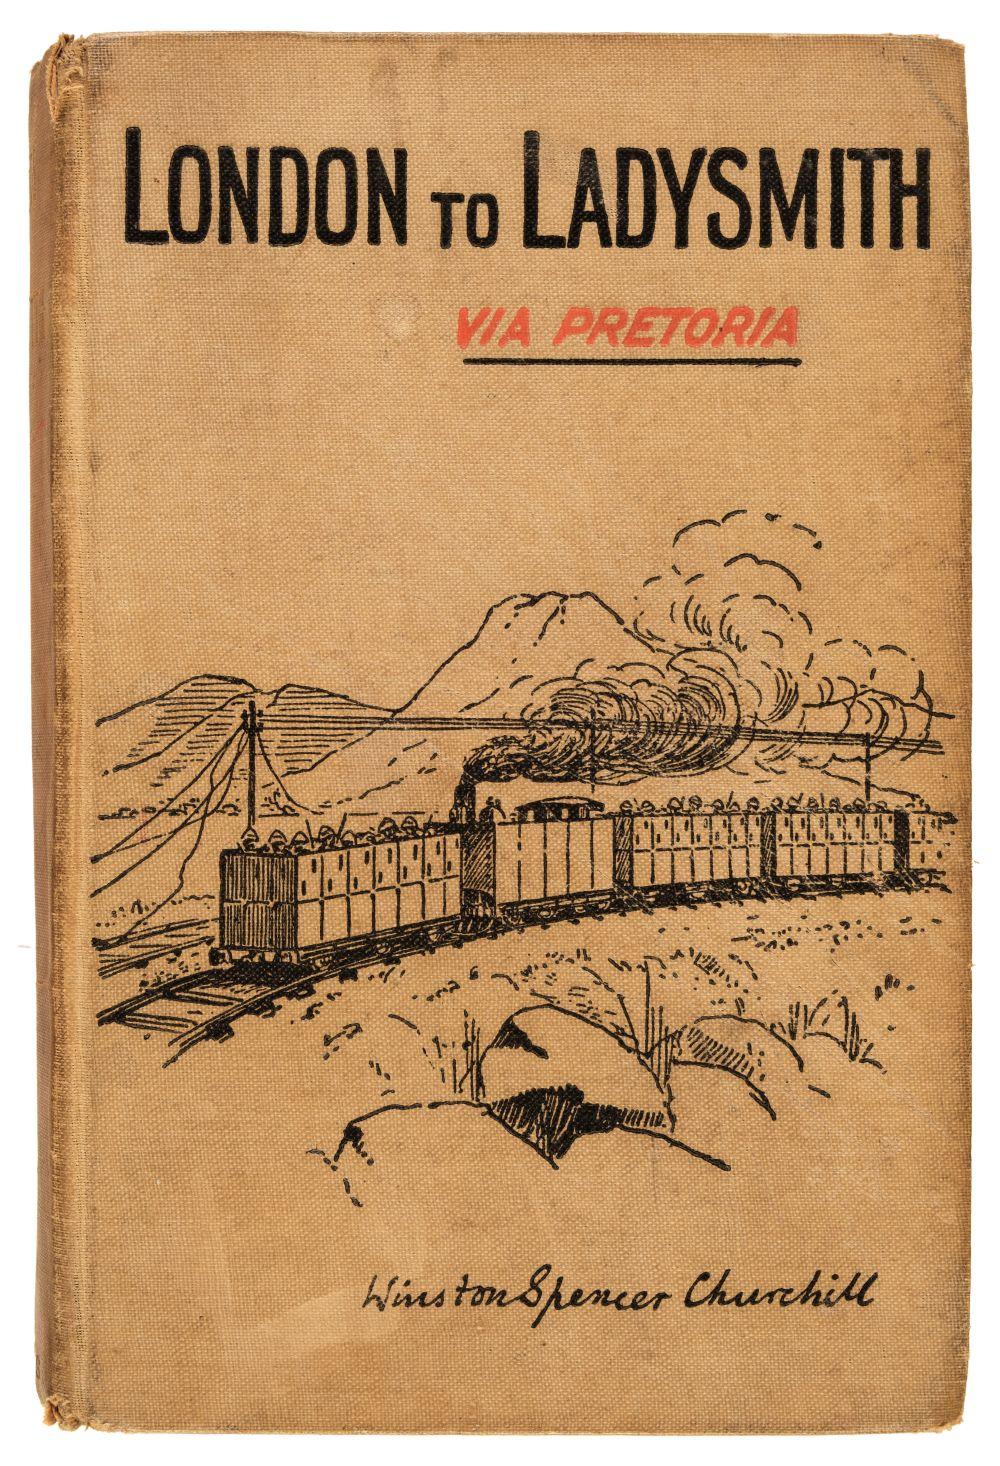 Churchill (Winston S.) London to Ladysmith via Pretoria, 1st edition, 1900